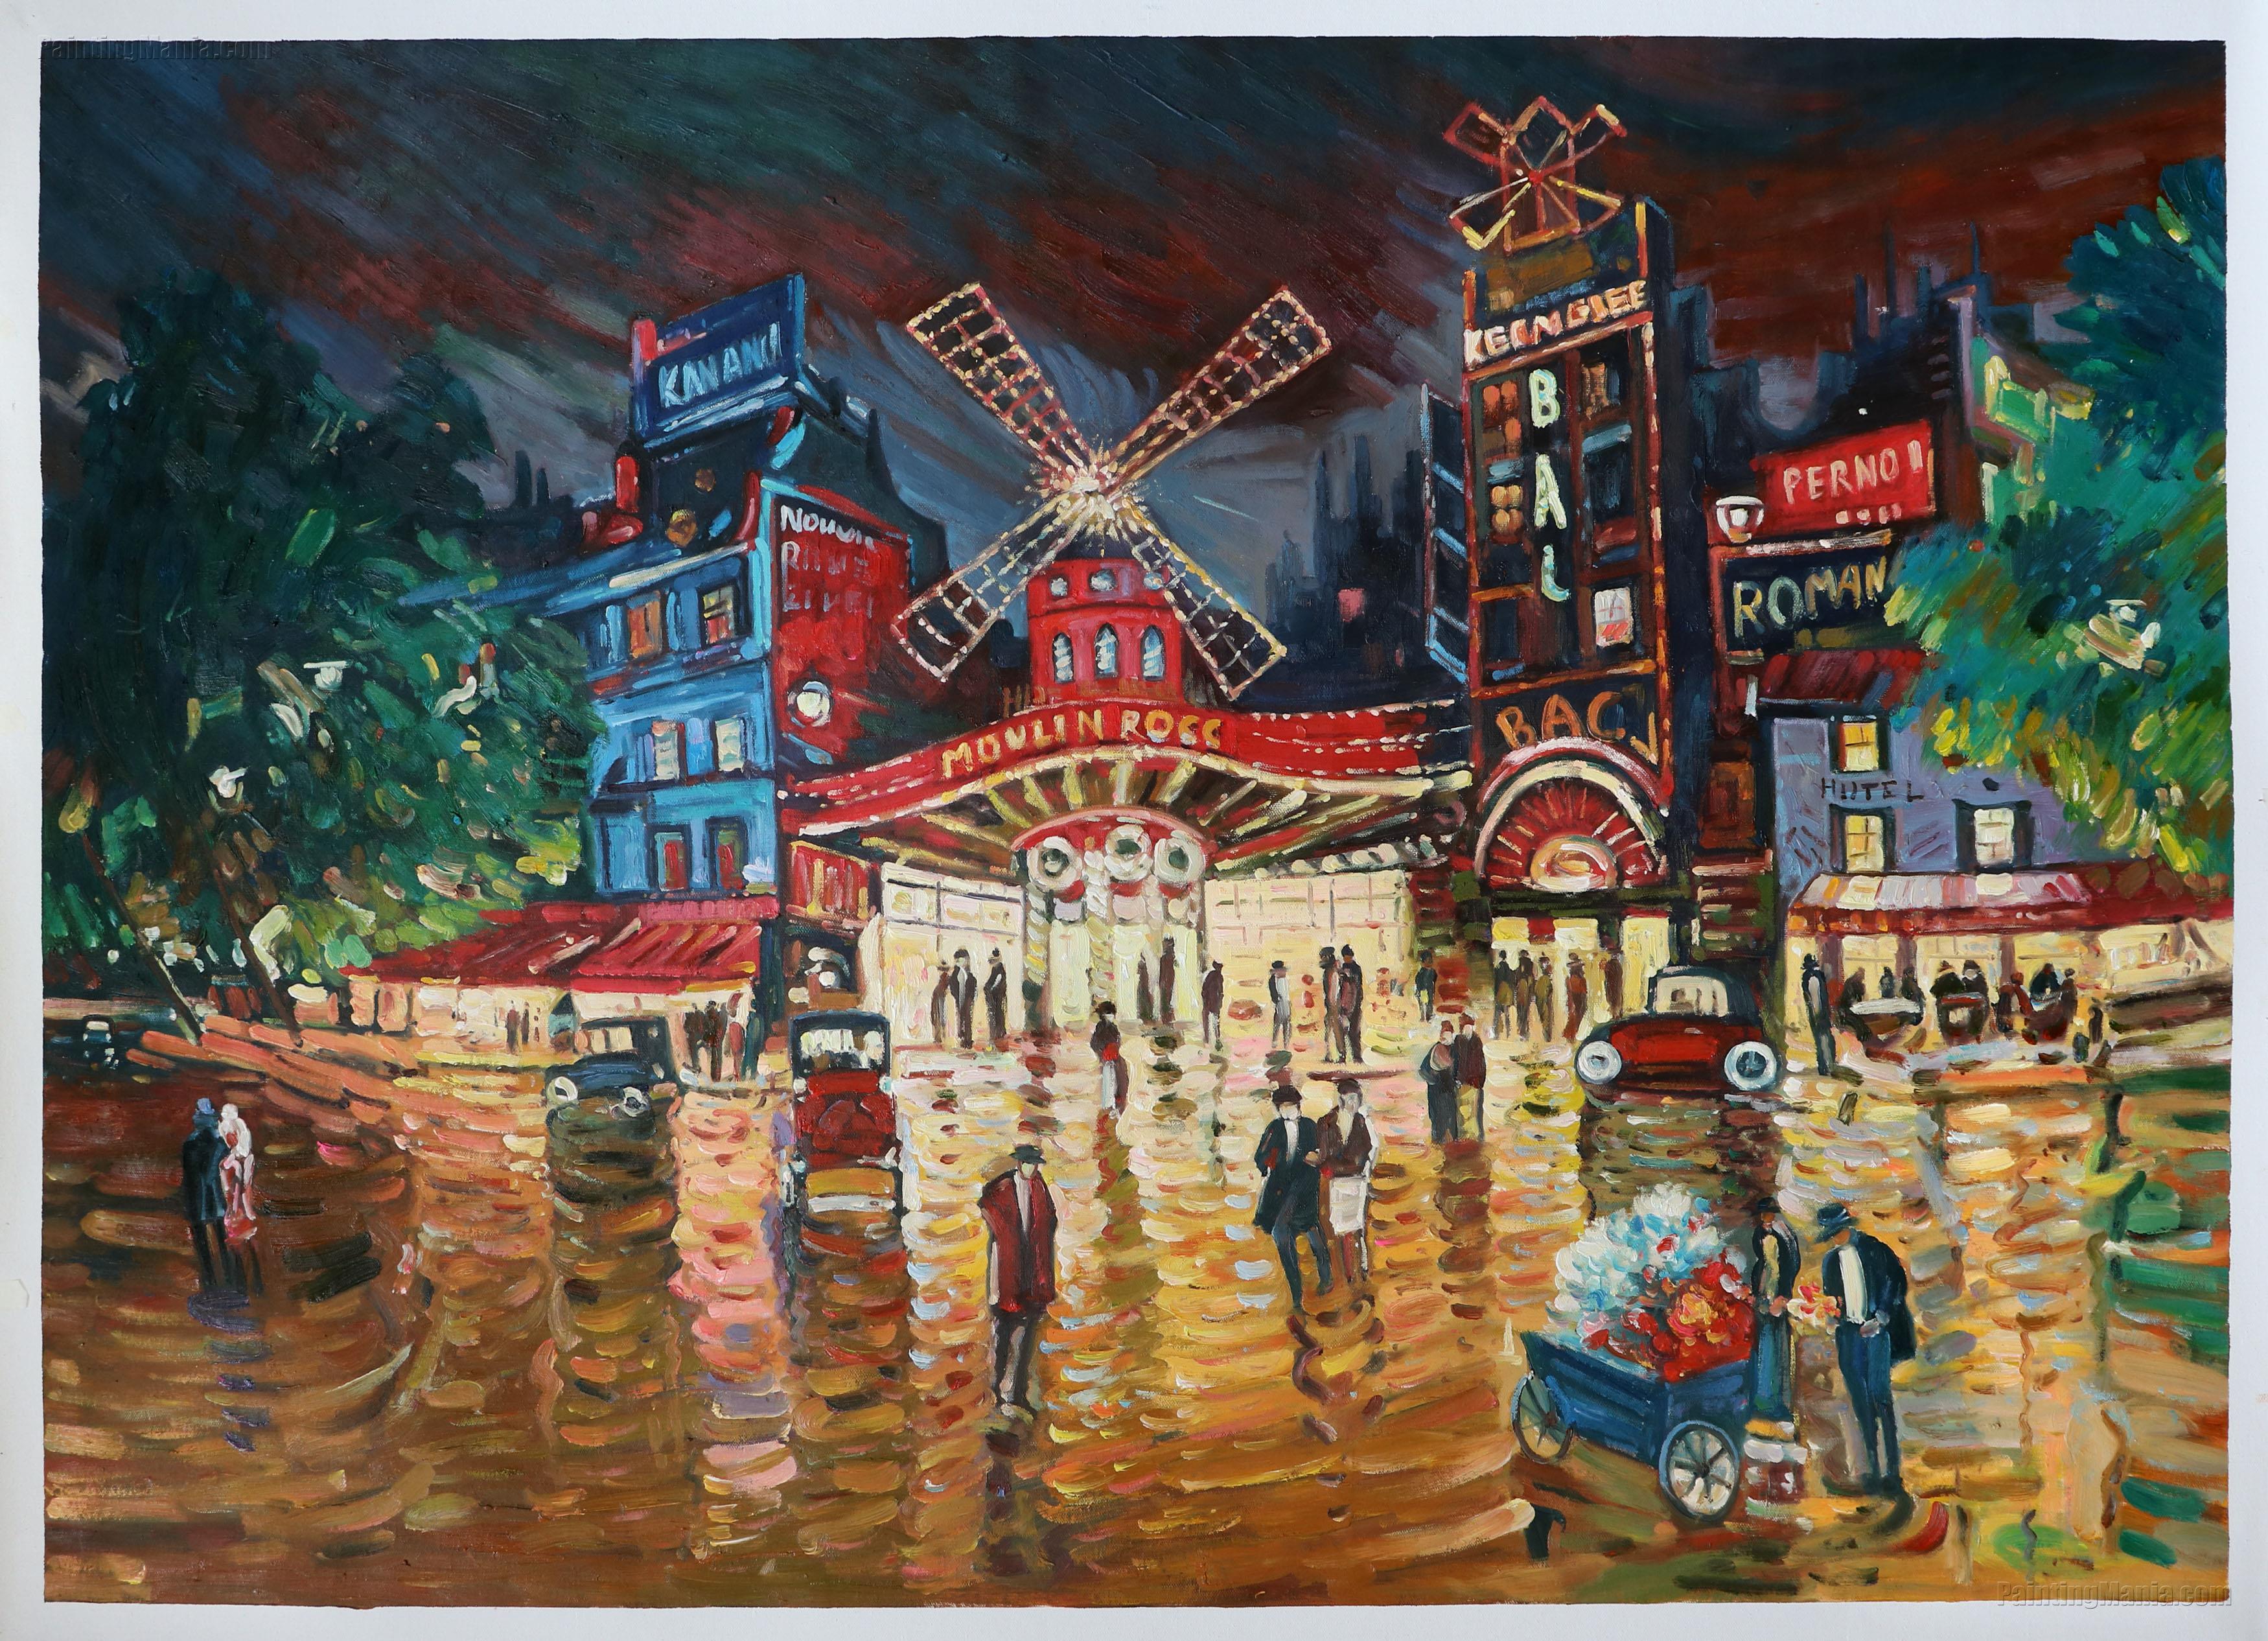 Konstantin Korovin: an impressionist painter